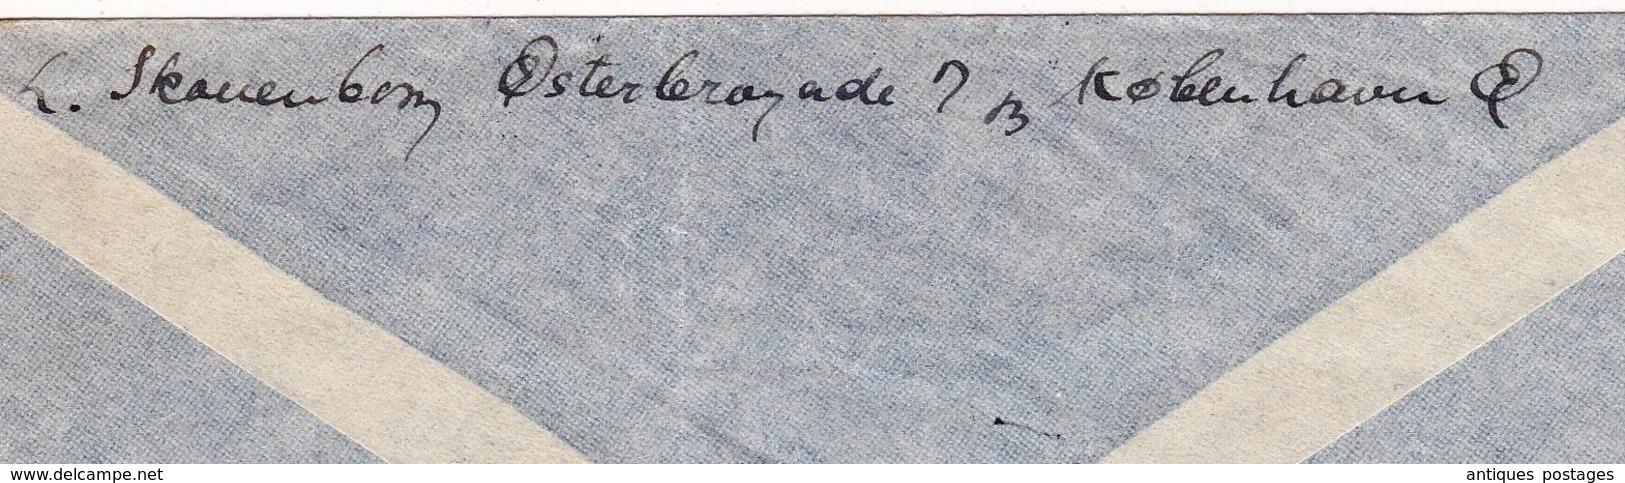 Lettre Copenhague Julen 1945 København Danemark Kongeriget Danmark Washington USA - Brieven En Documenten